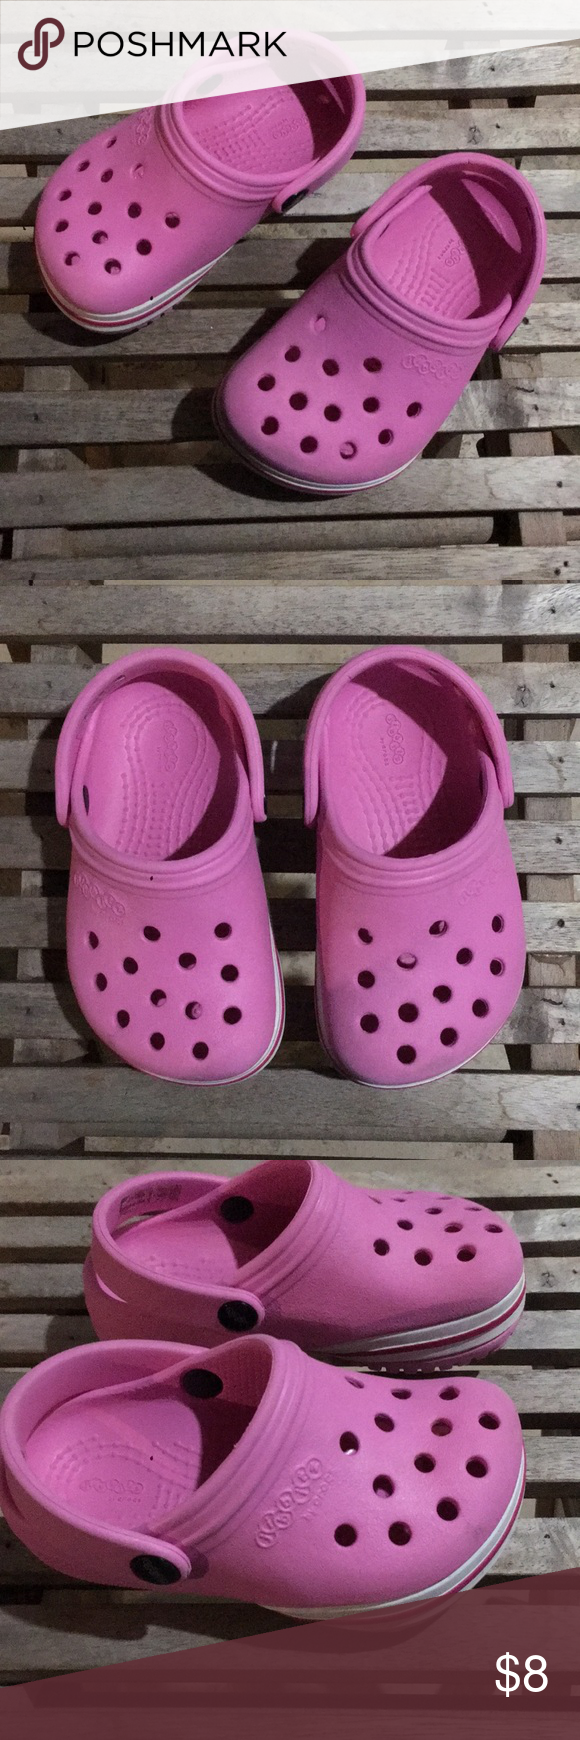 pink crocs size 6